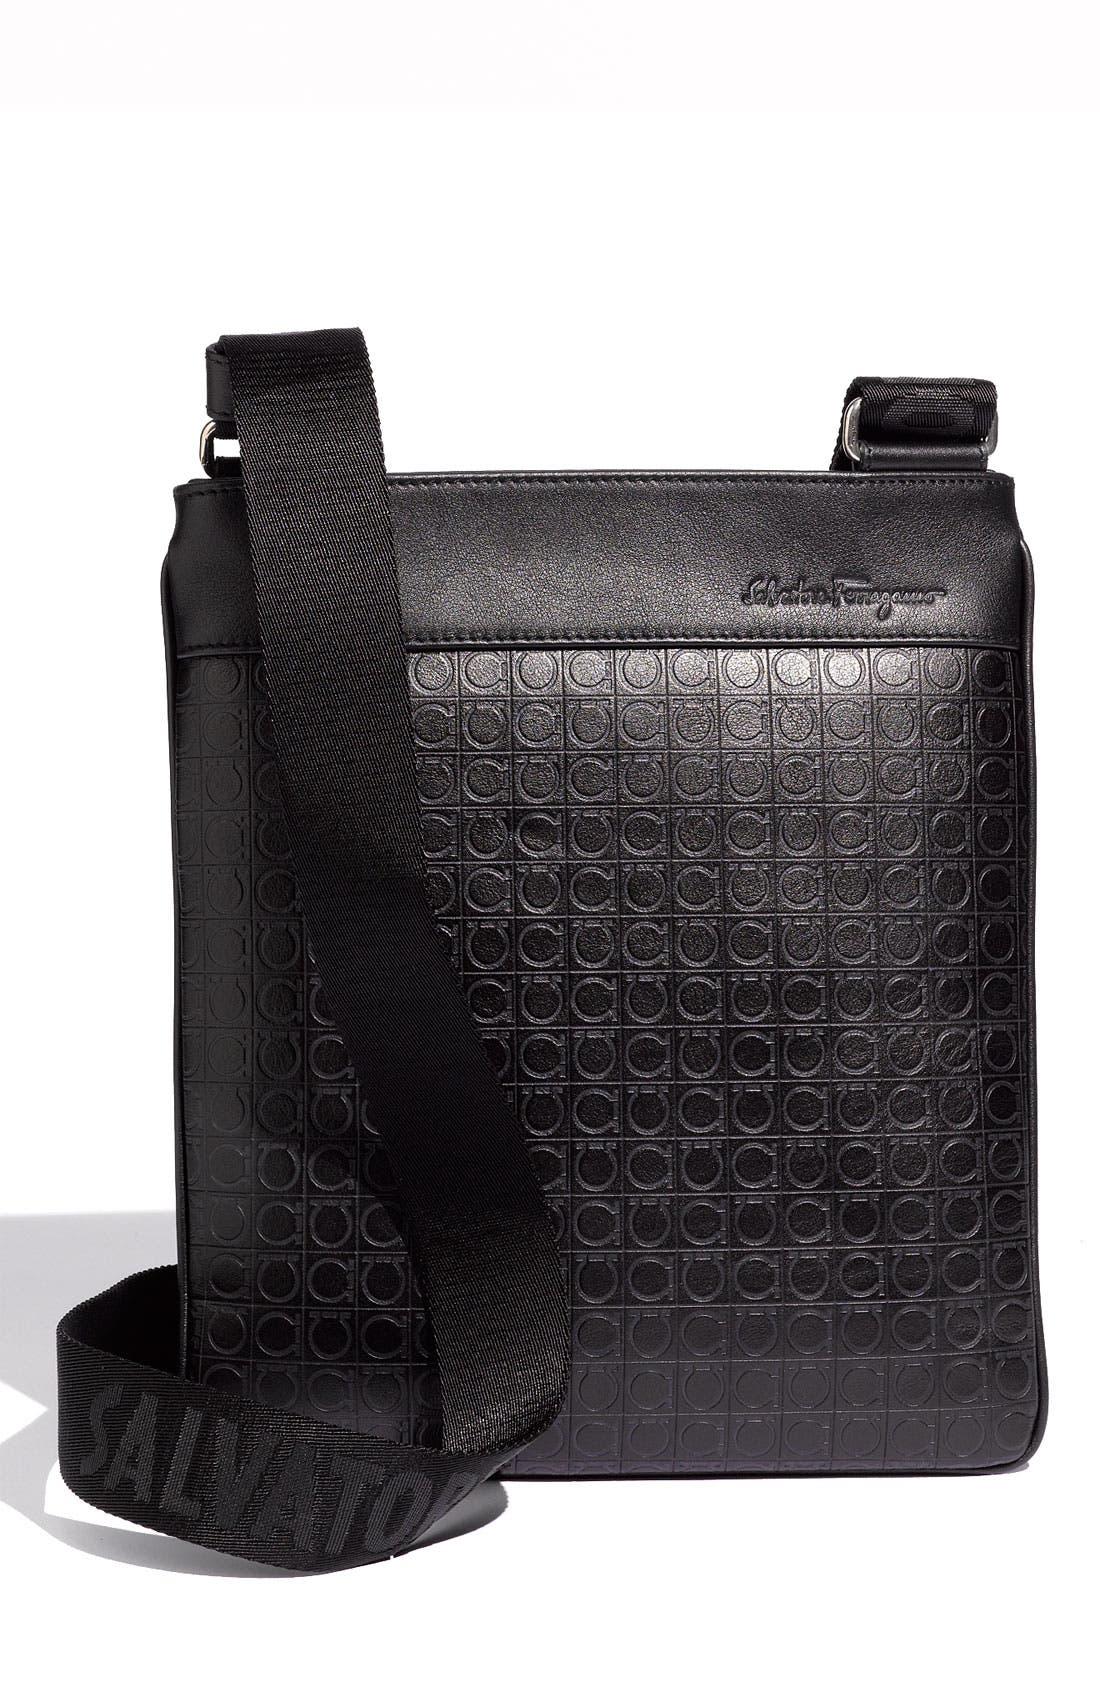 Alternate Image 1 Selected - Salvatore Ferragamo 'Gamma' Messenger Bag